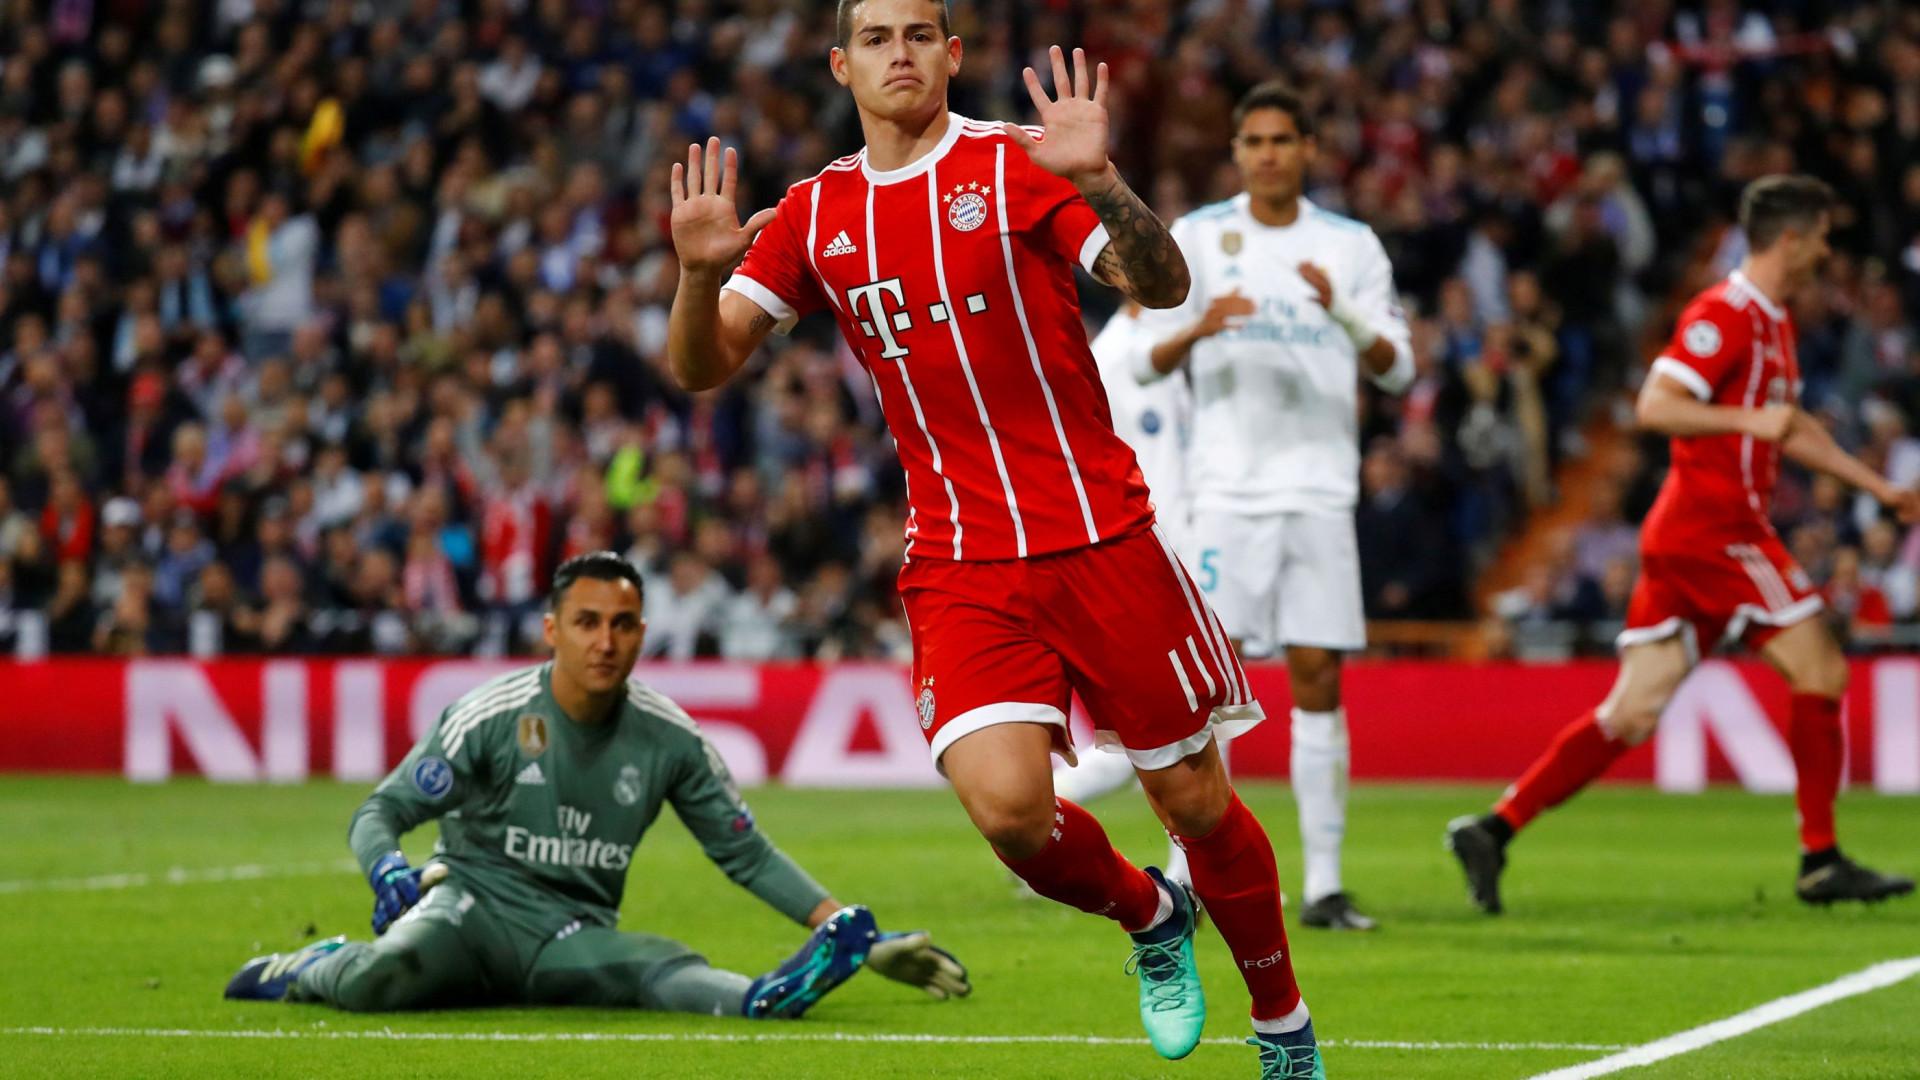 James pretende regressar ao Real Madrid